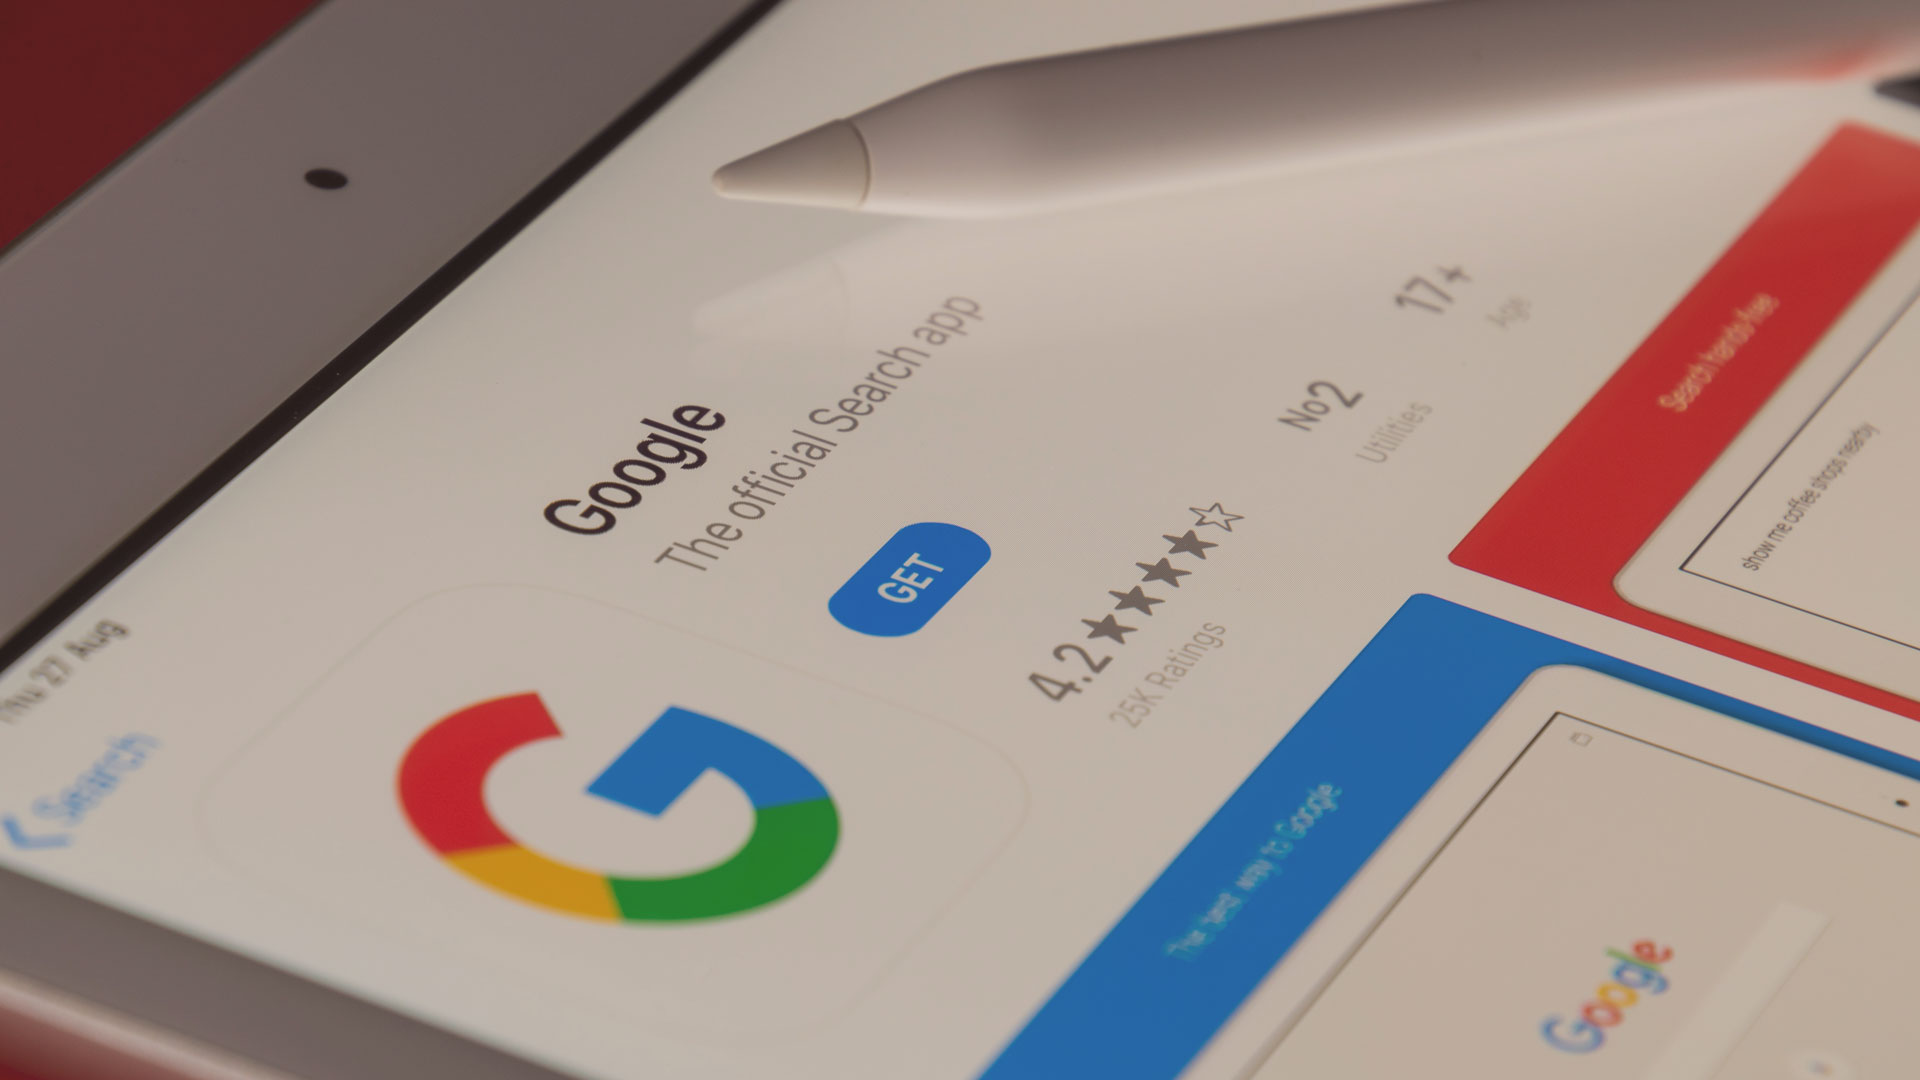 Google Ads February 2021 update: Phrase match gets modified